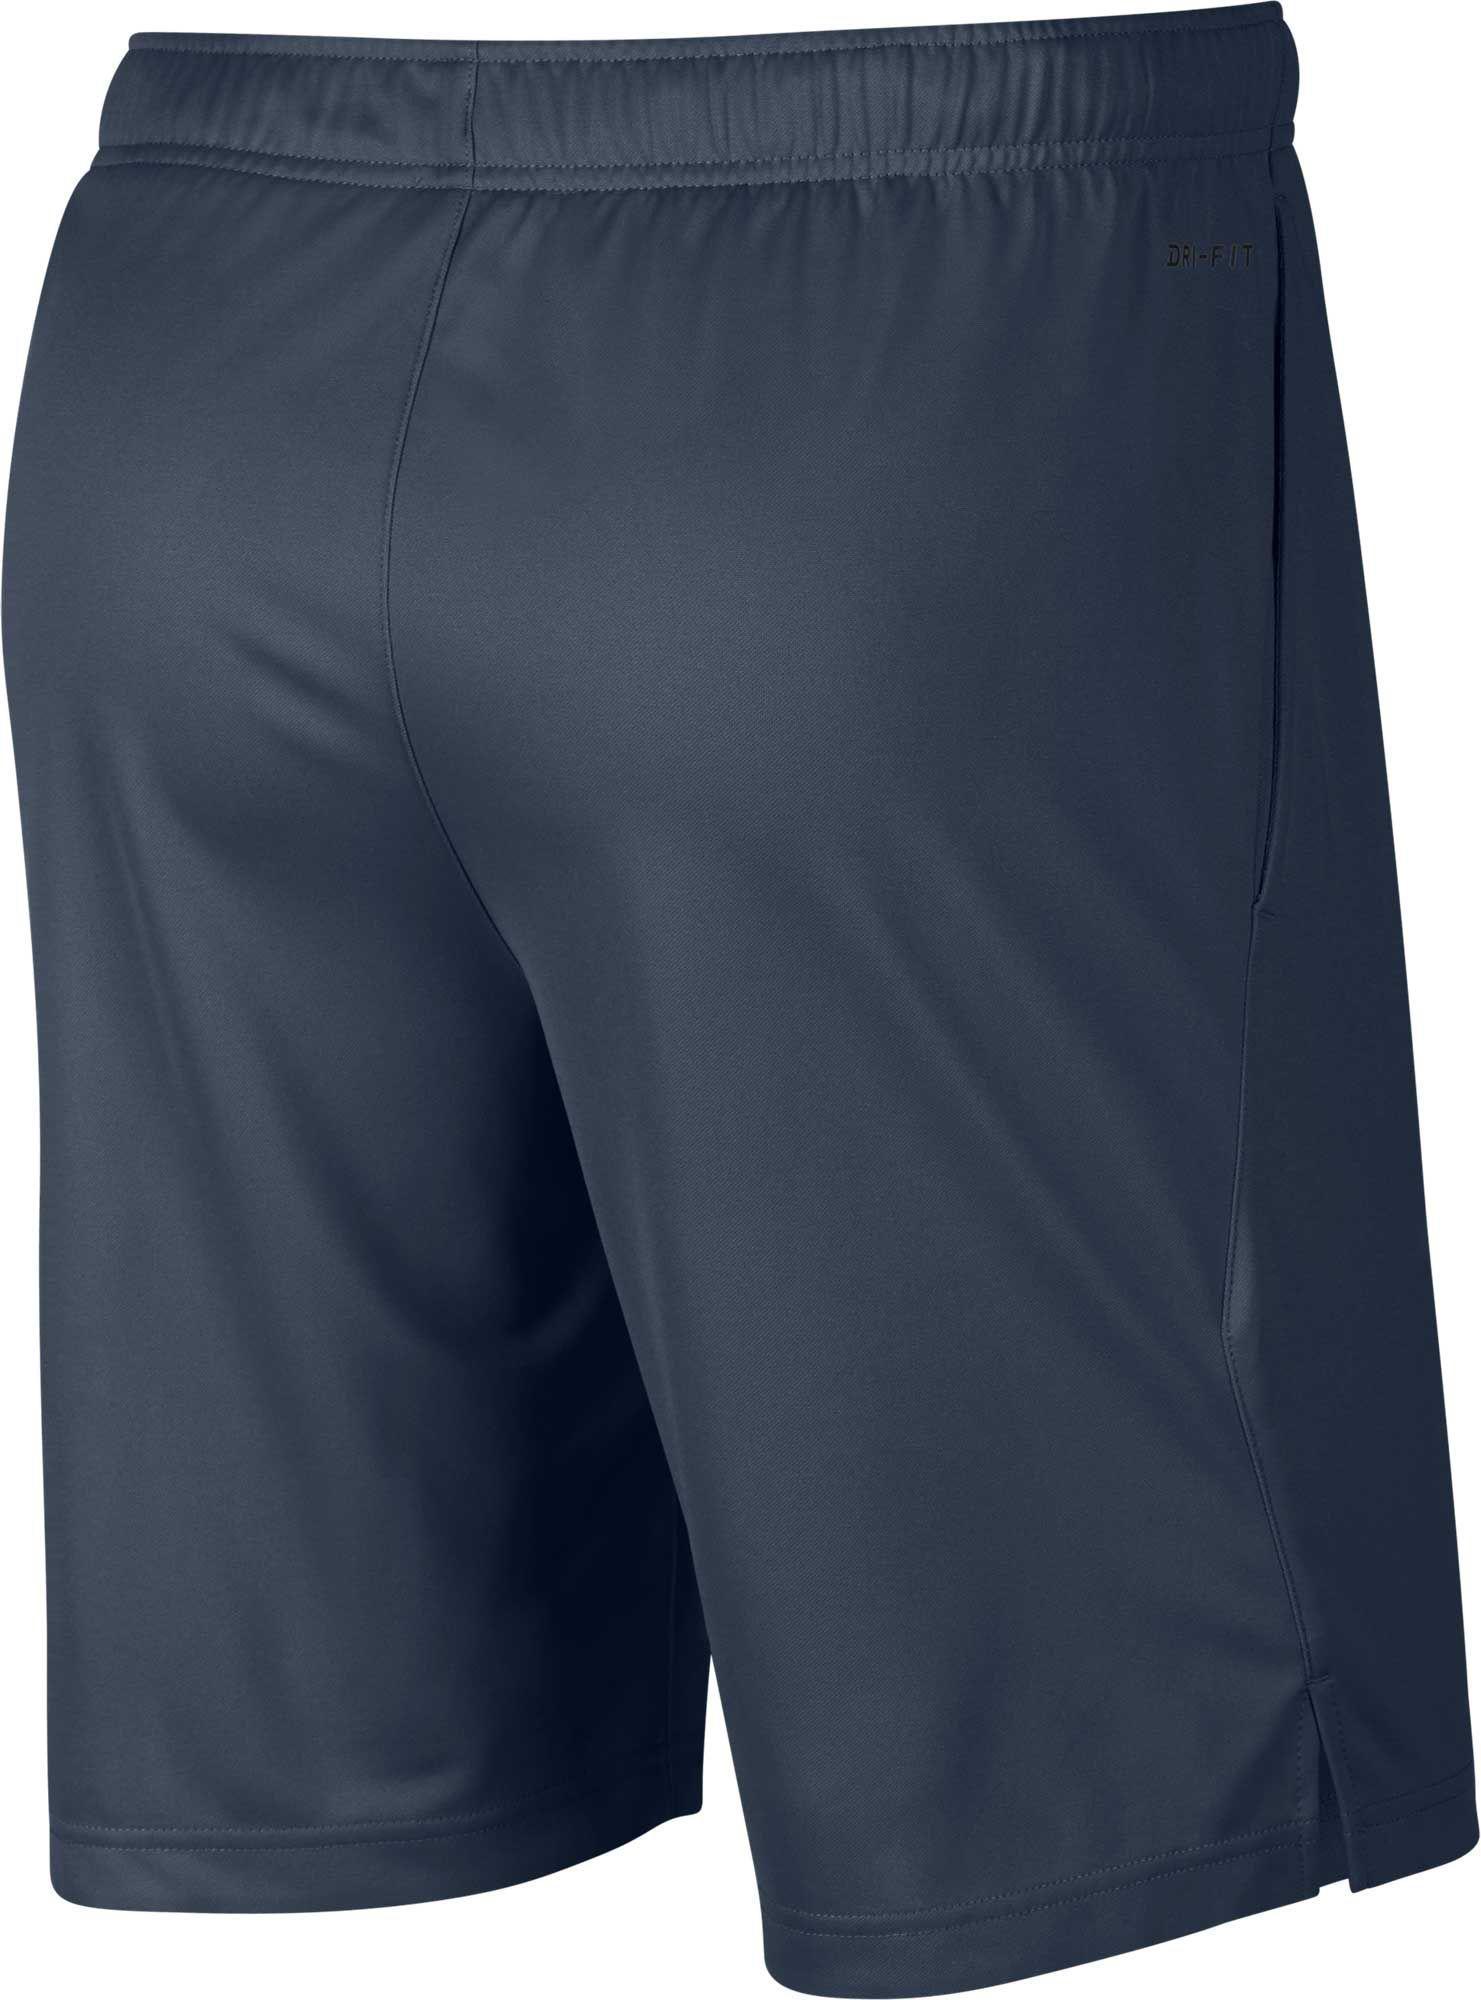 Nike - Blue Dry Epic Training Shorts for Men - Lyst. View fullscreen 0216adcd8